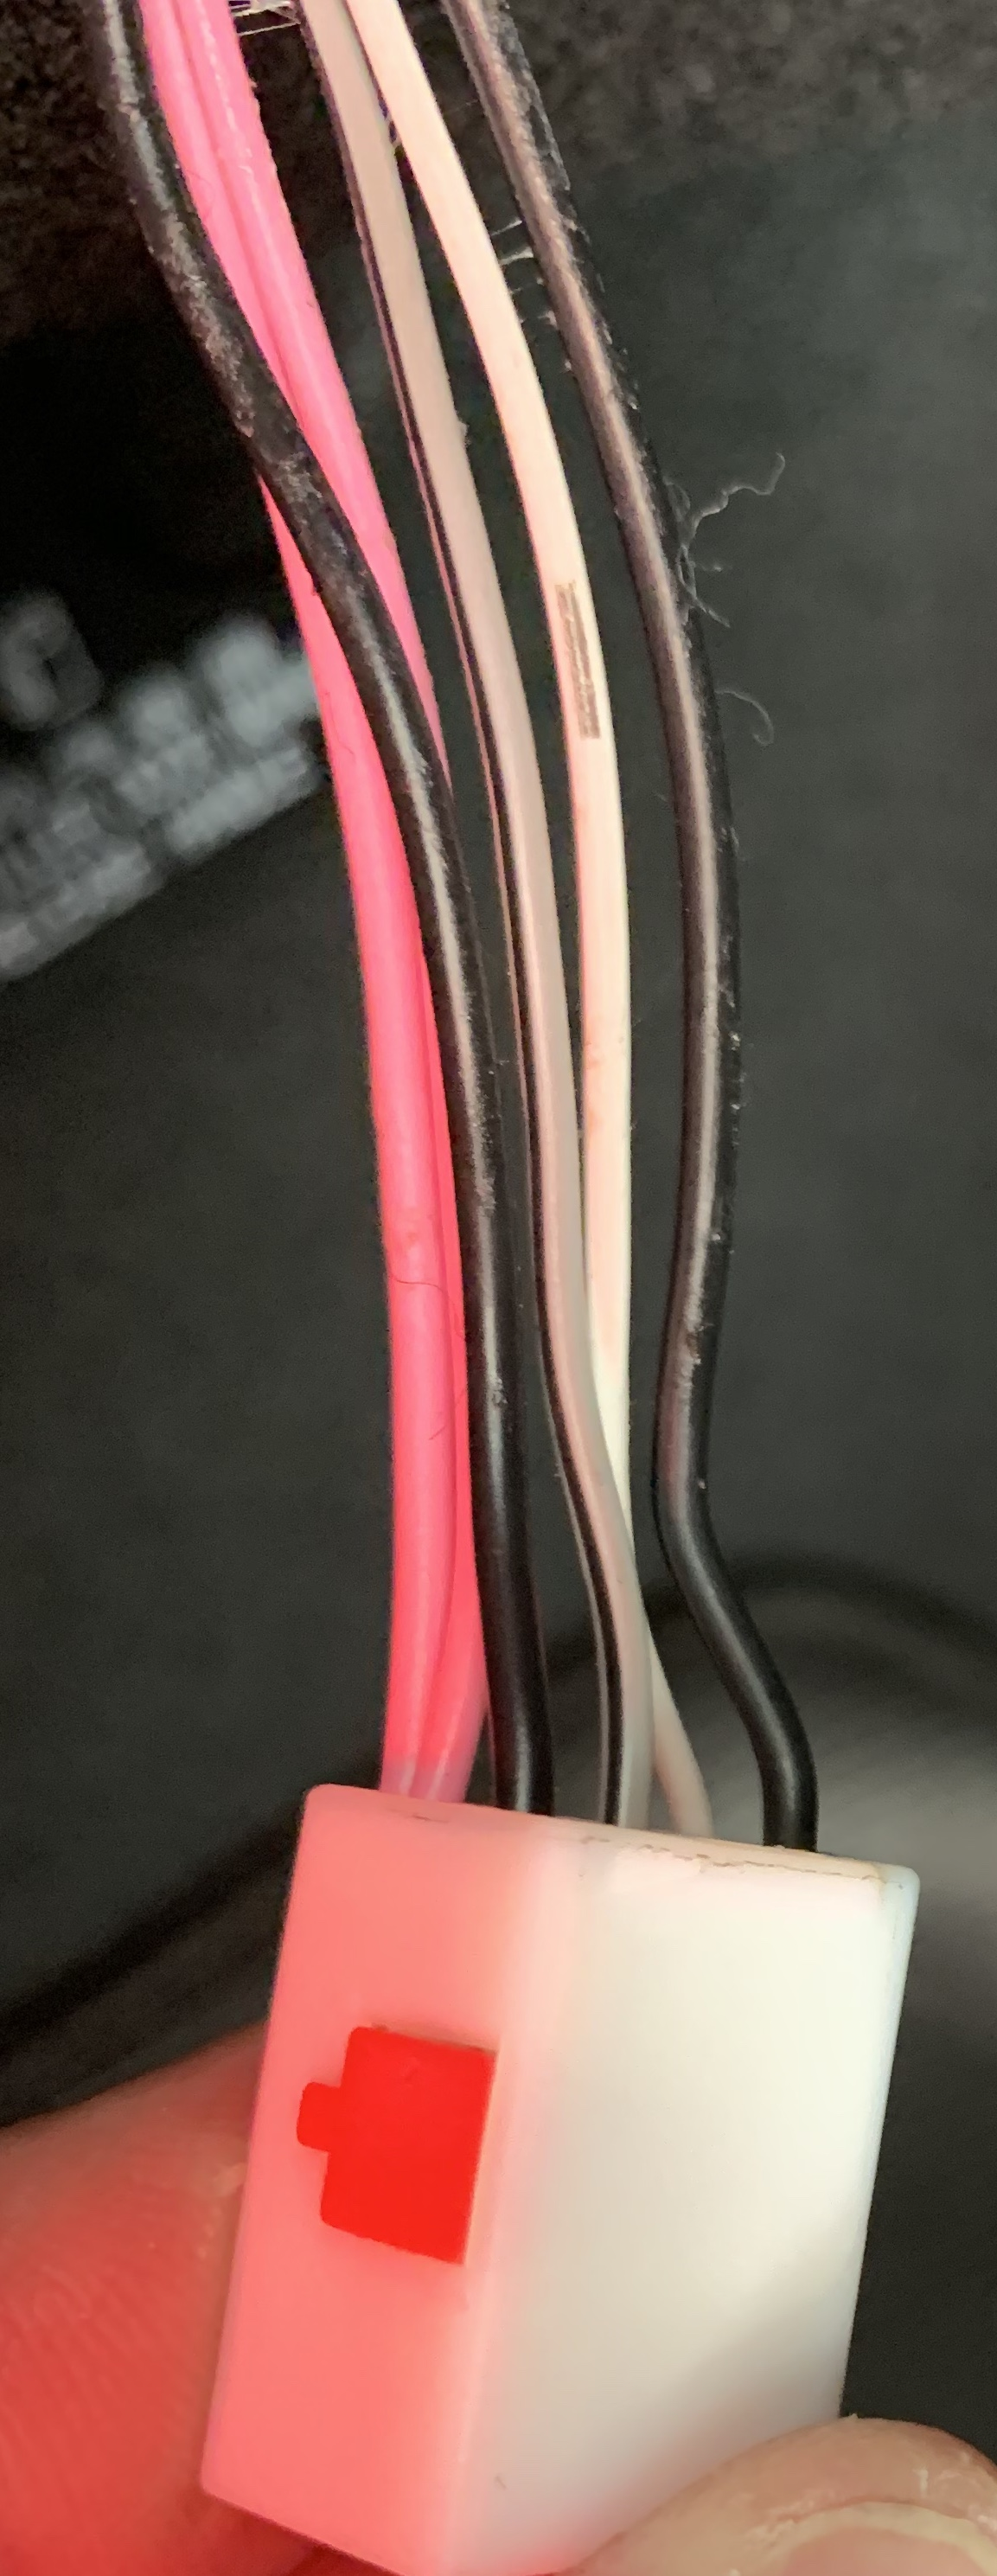 tail light electrical wiring question, please help! | kia optima forums  kia optima forums